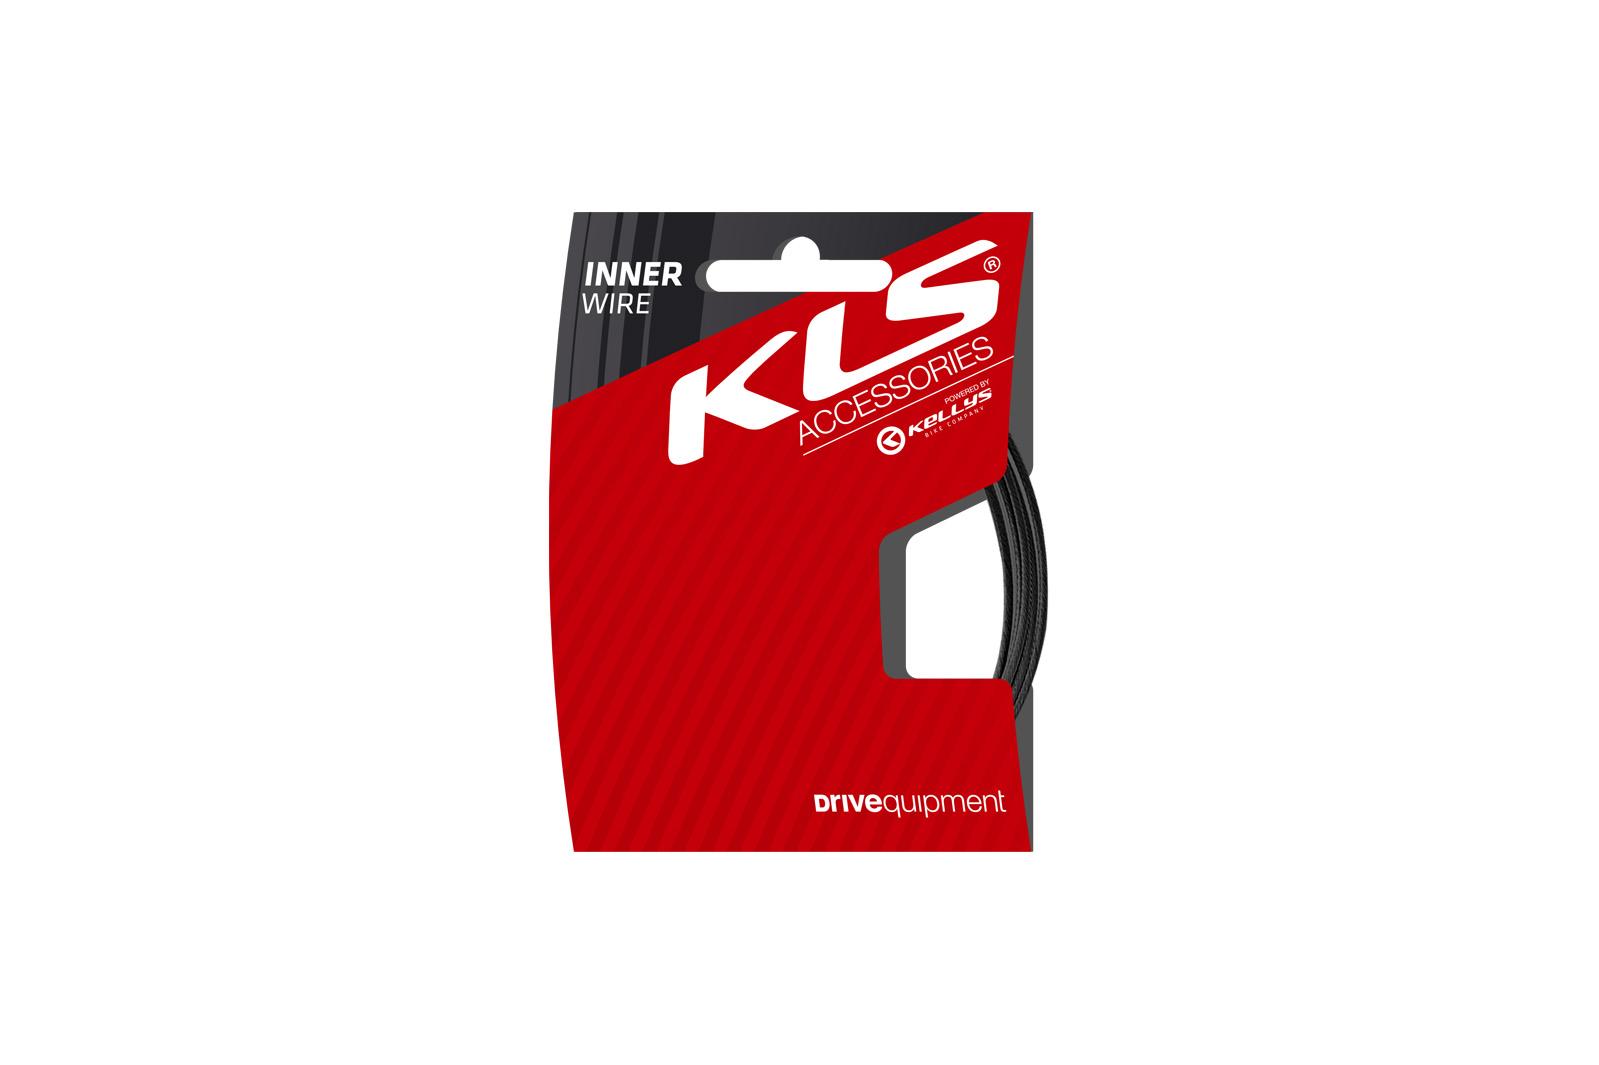 Lanko řazení KLS 210 cm, teflon